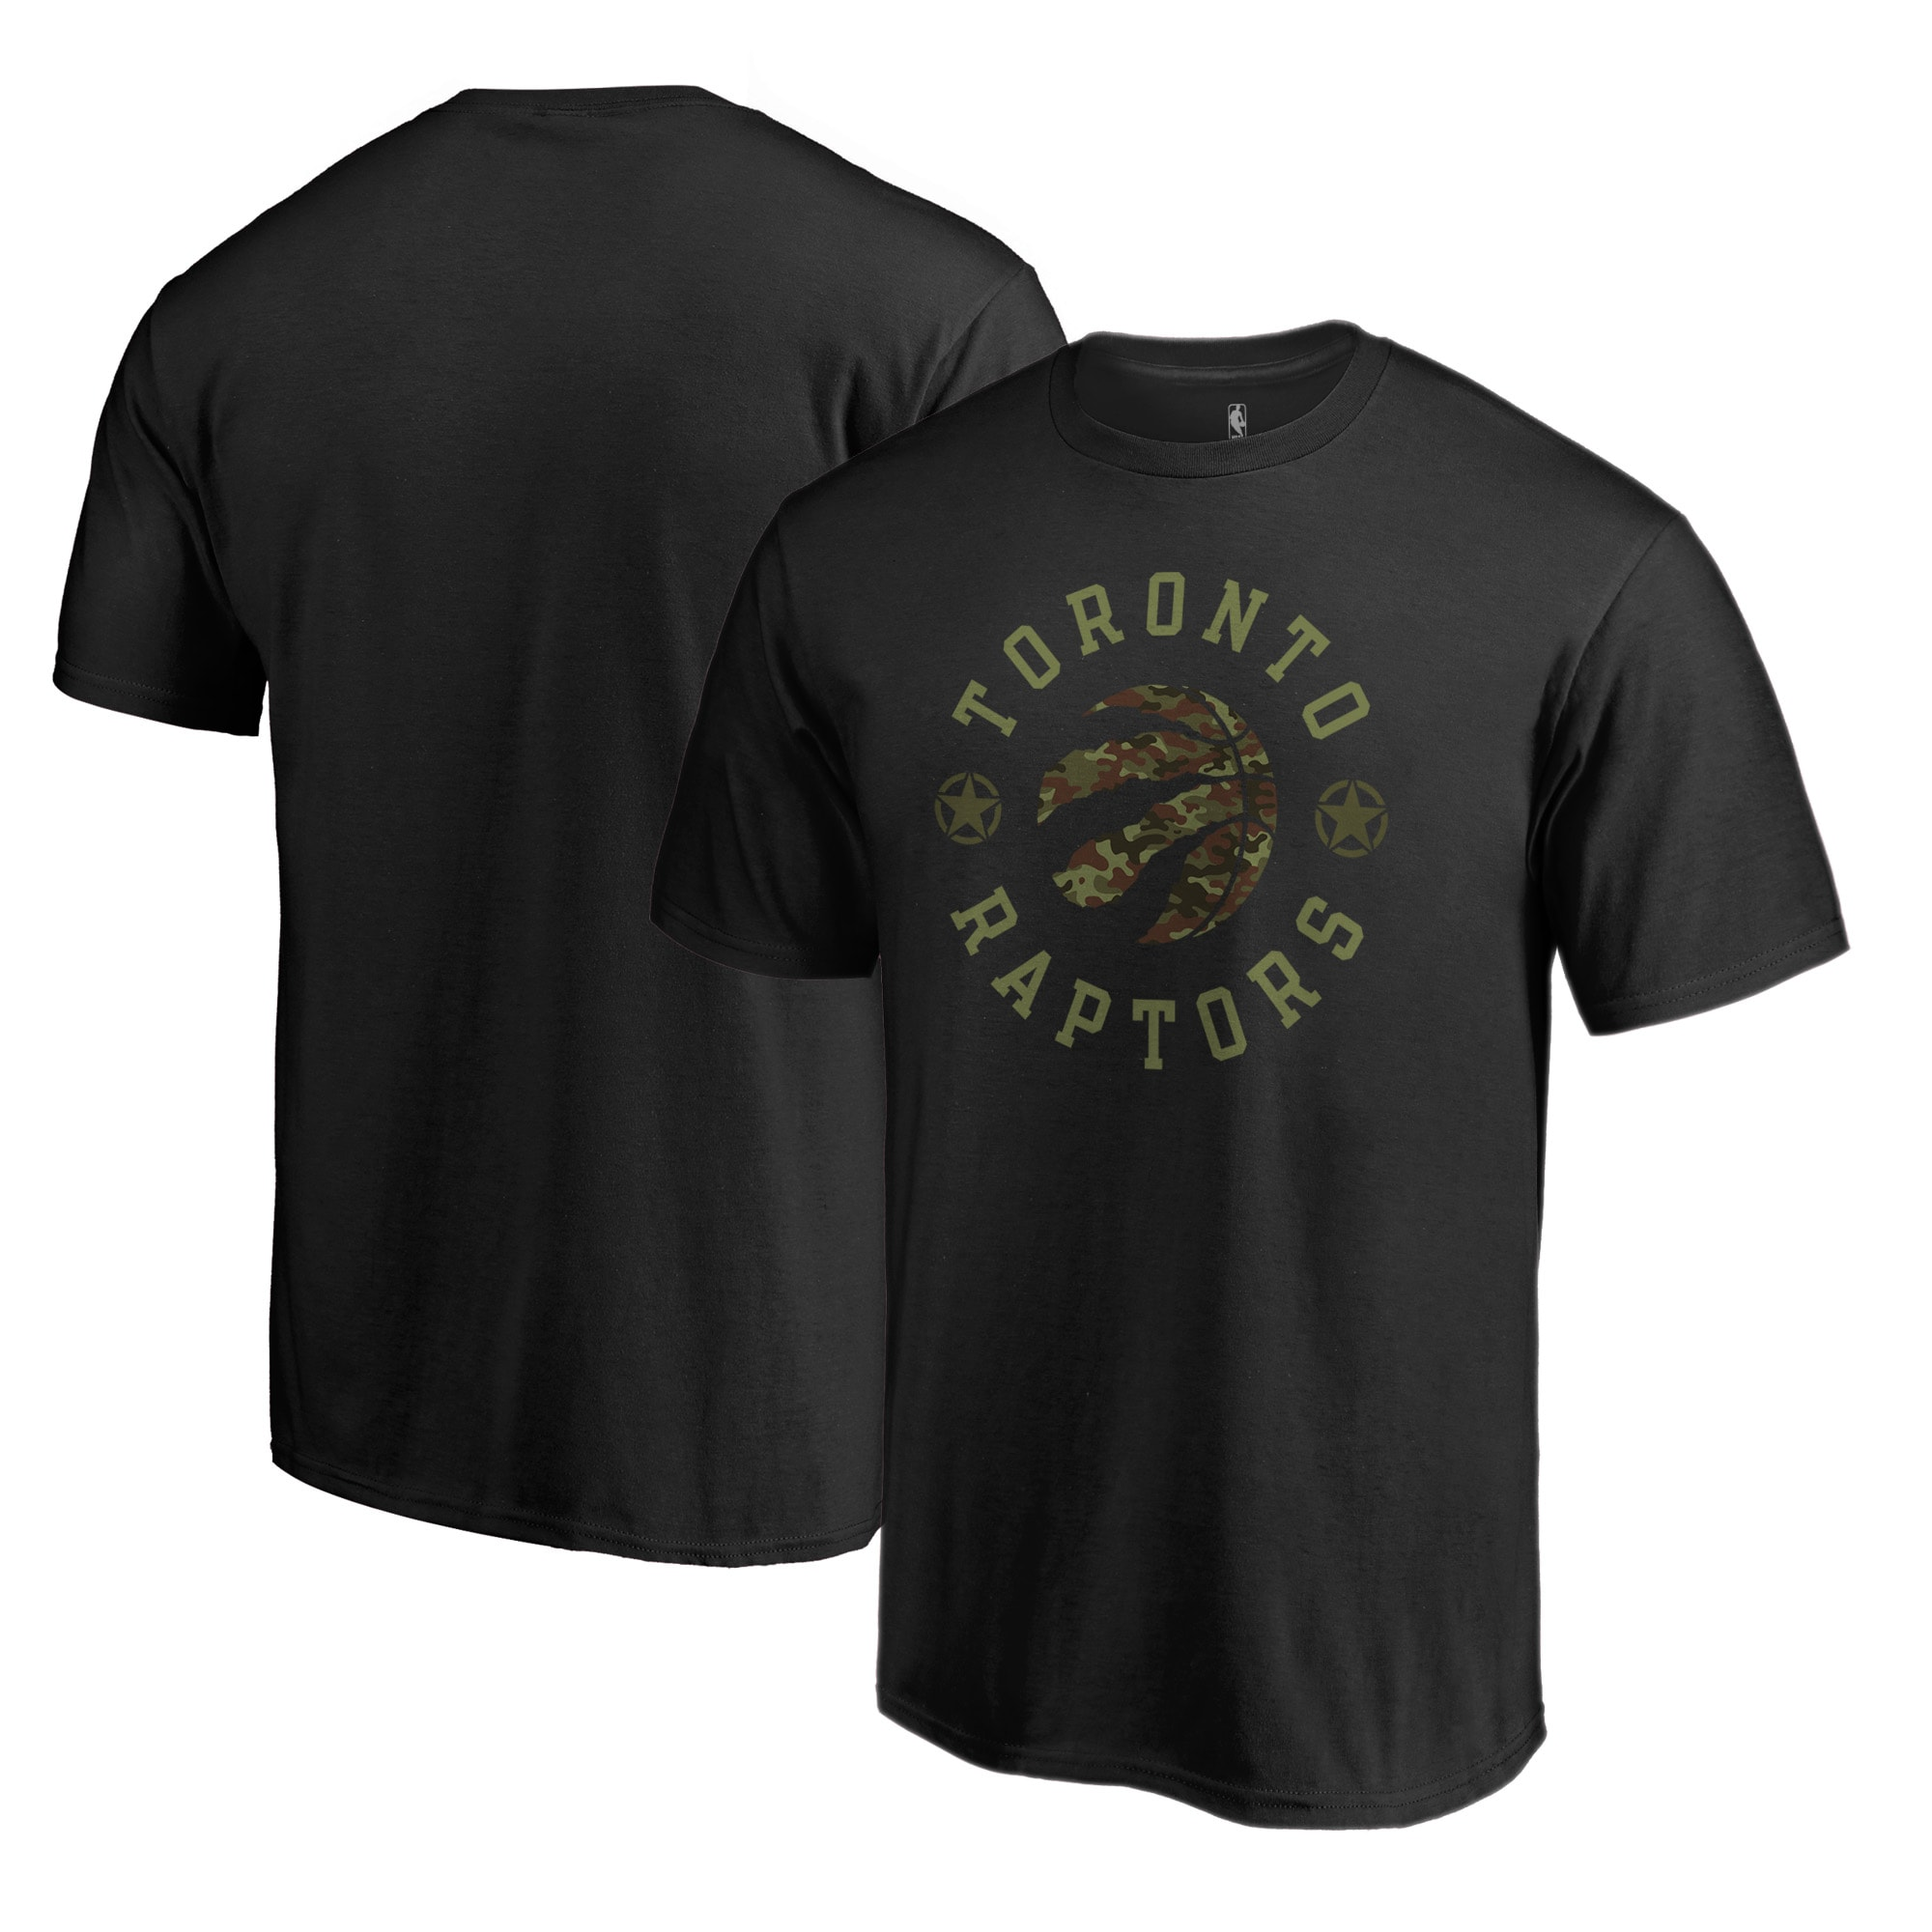 Toronto Raptors Fanatics Branded Liberty T-Shirt - Black